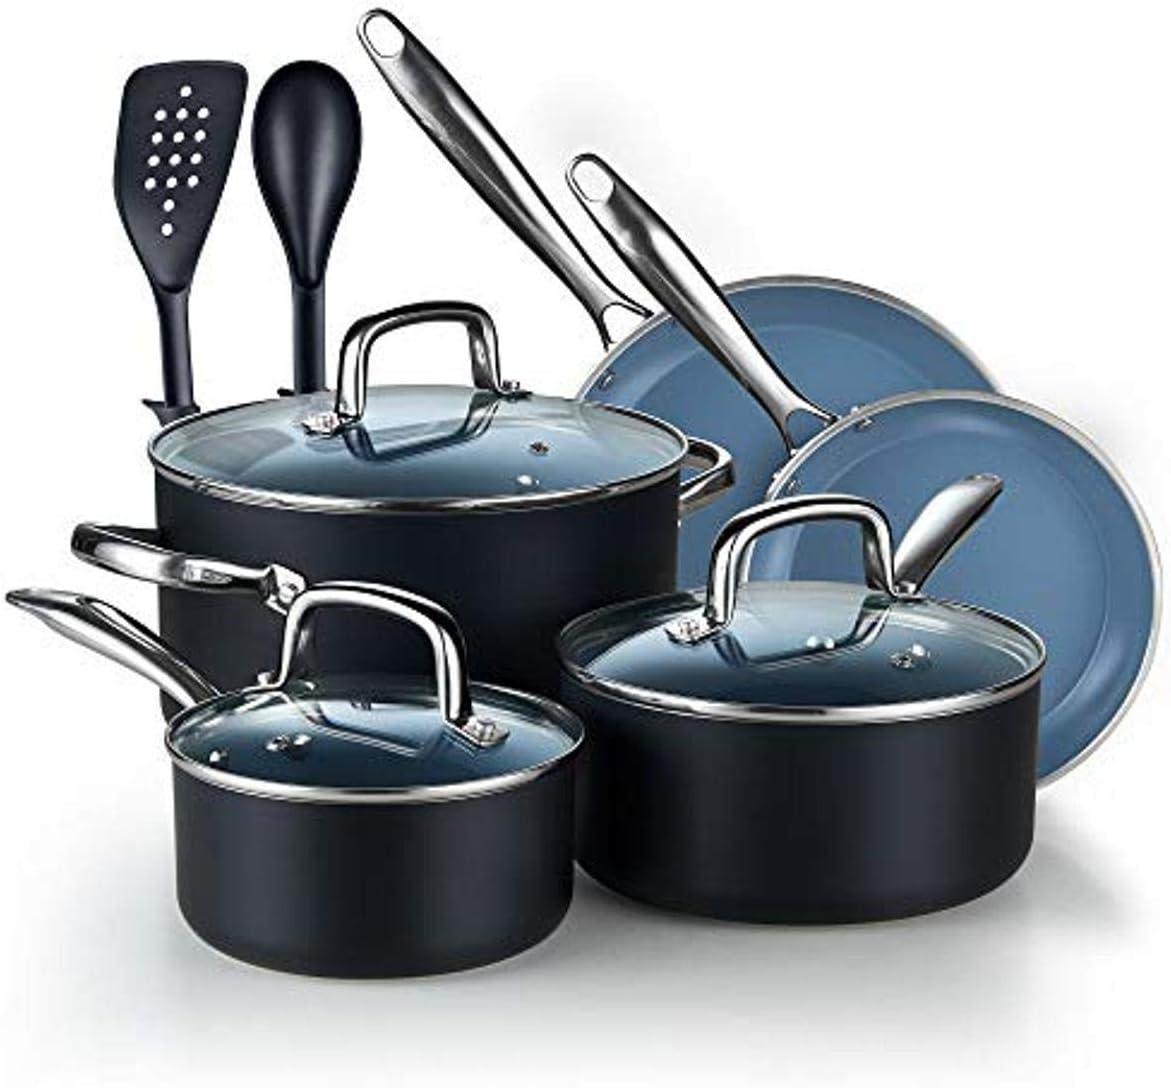 Cook N Home Ceramic Nonstick Cookware Saute fry pan Grey 3.5-Qt